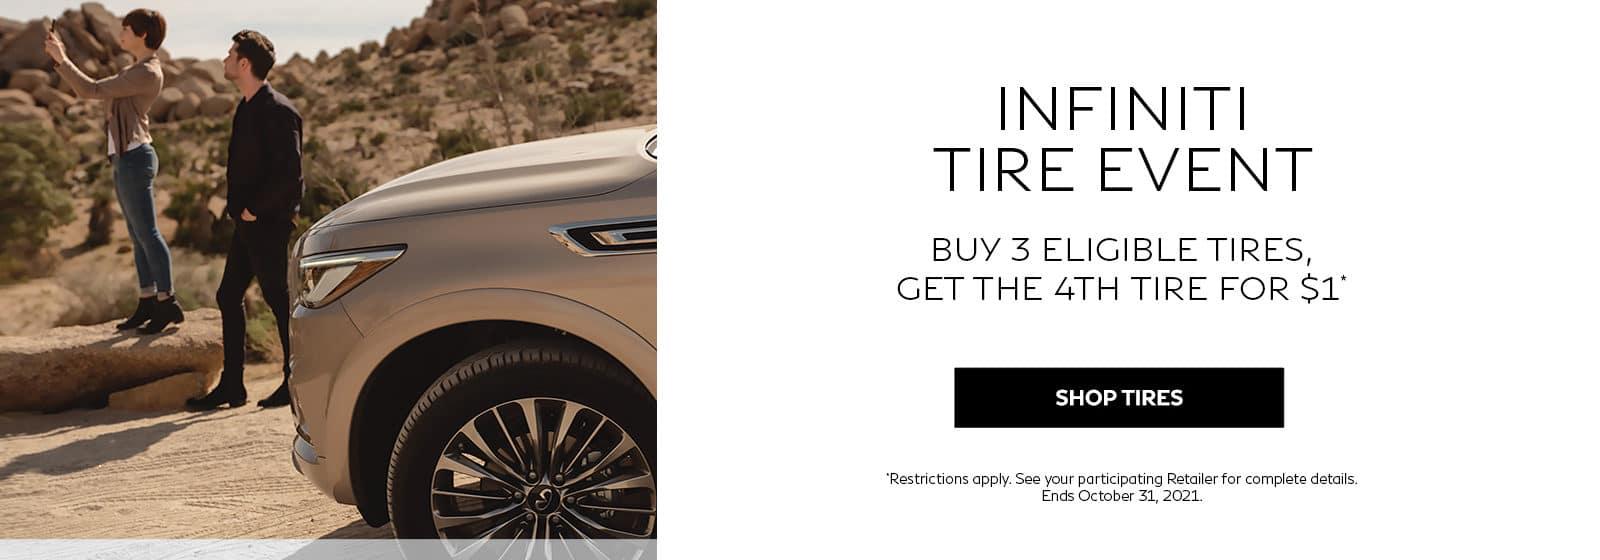 Holman INFINITI Tire Offer